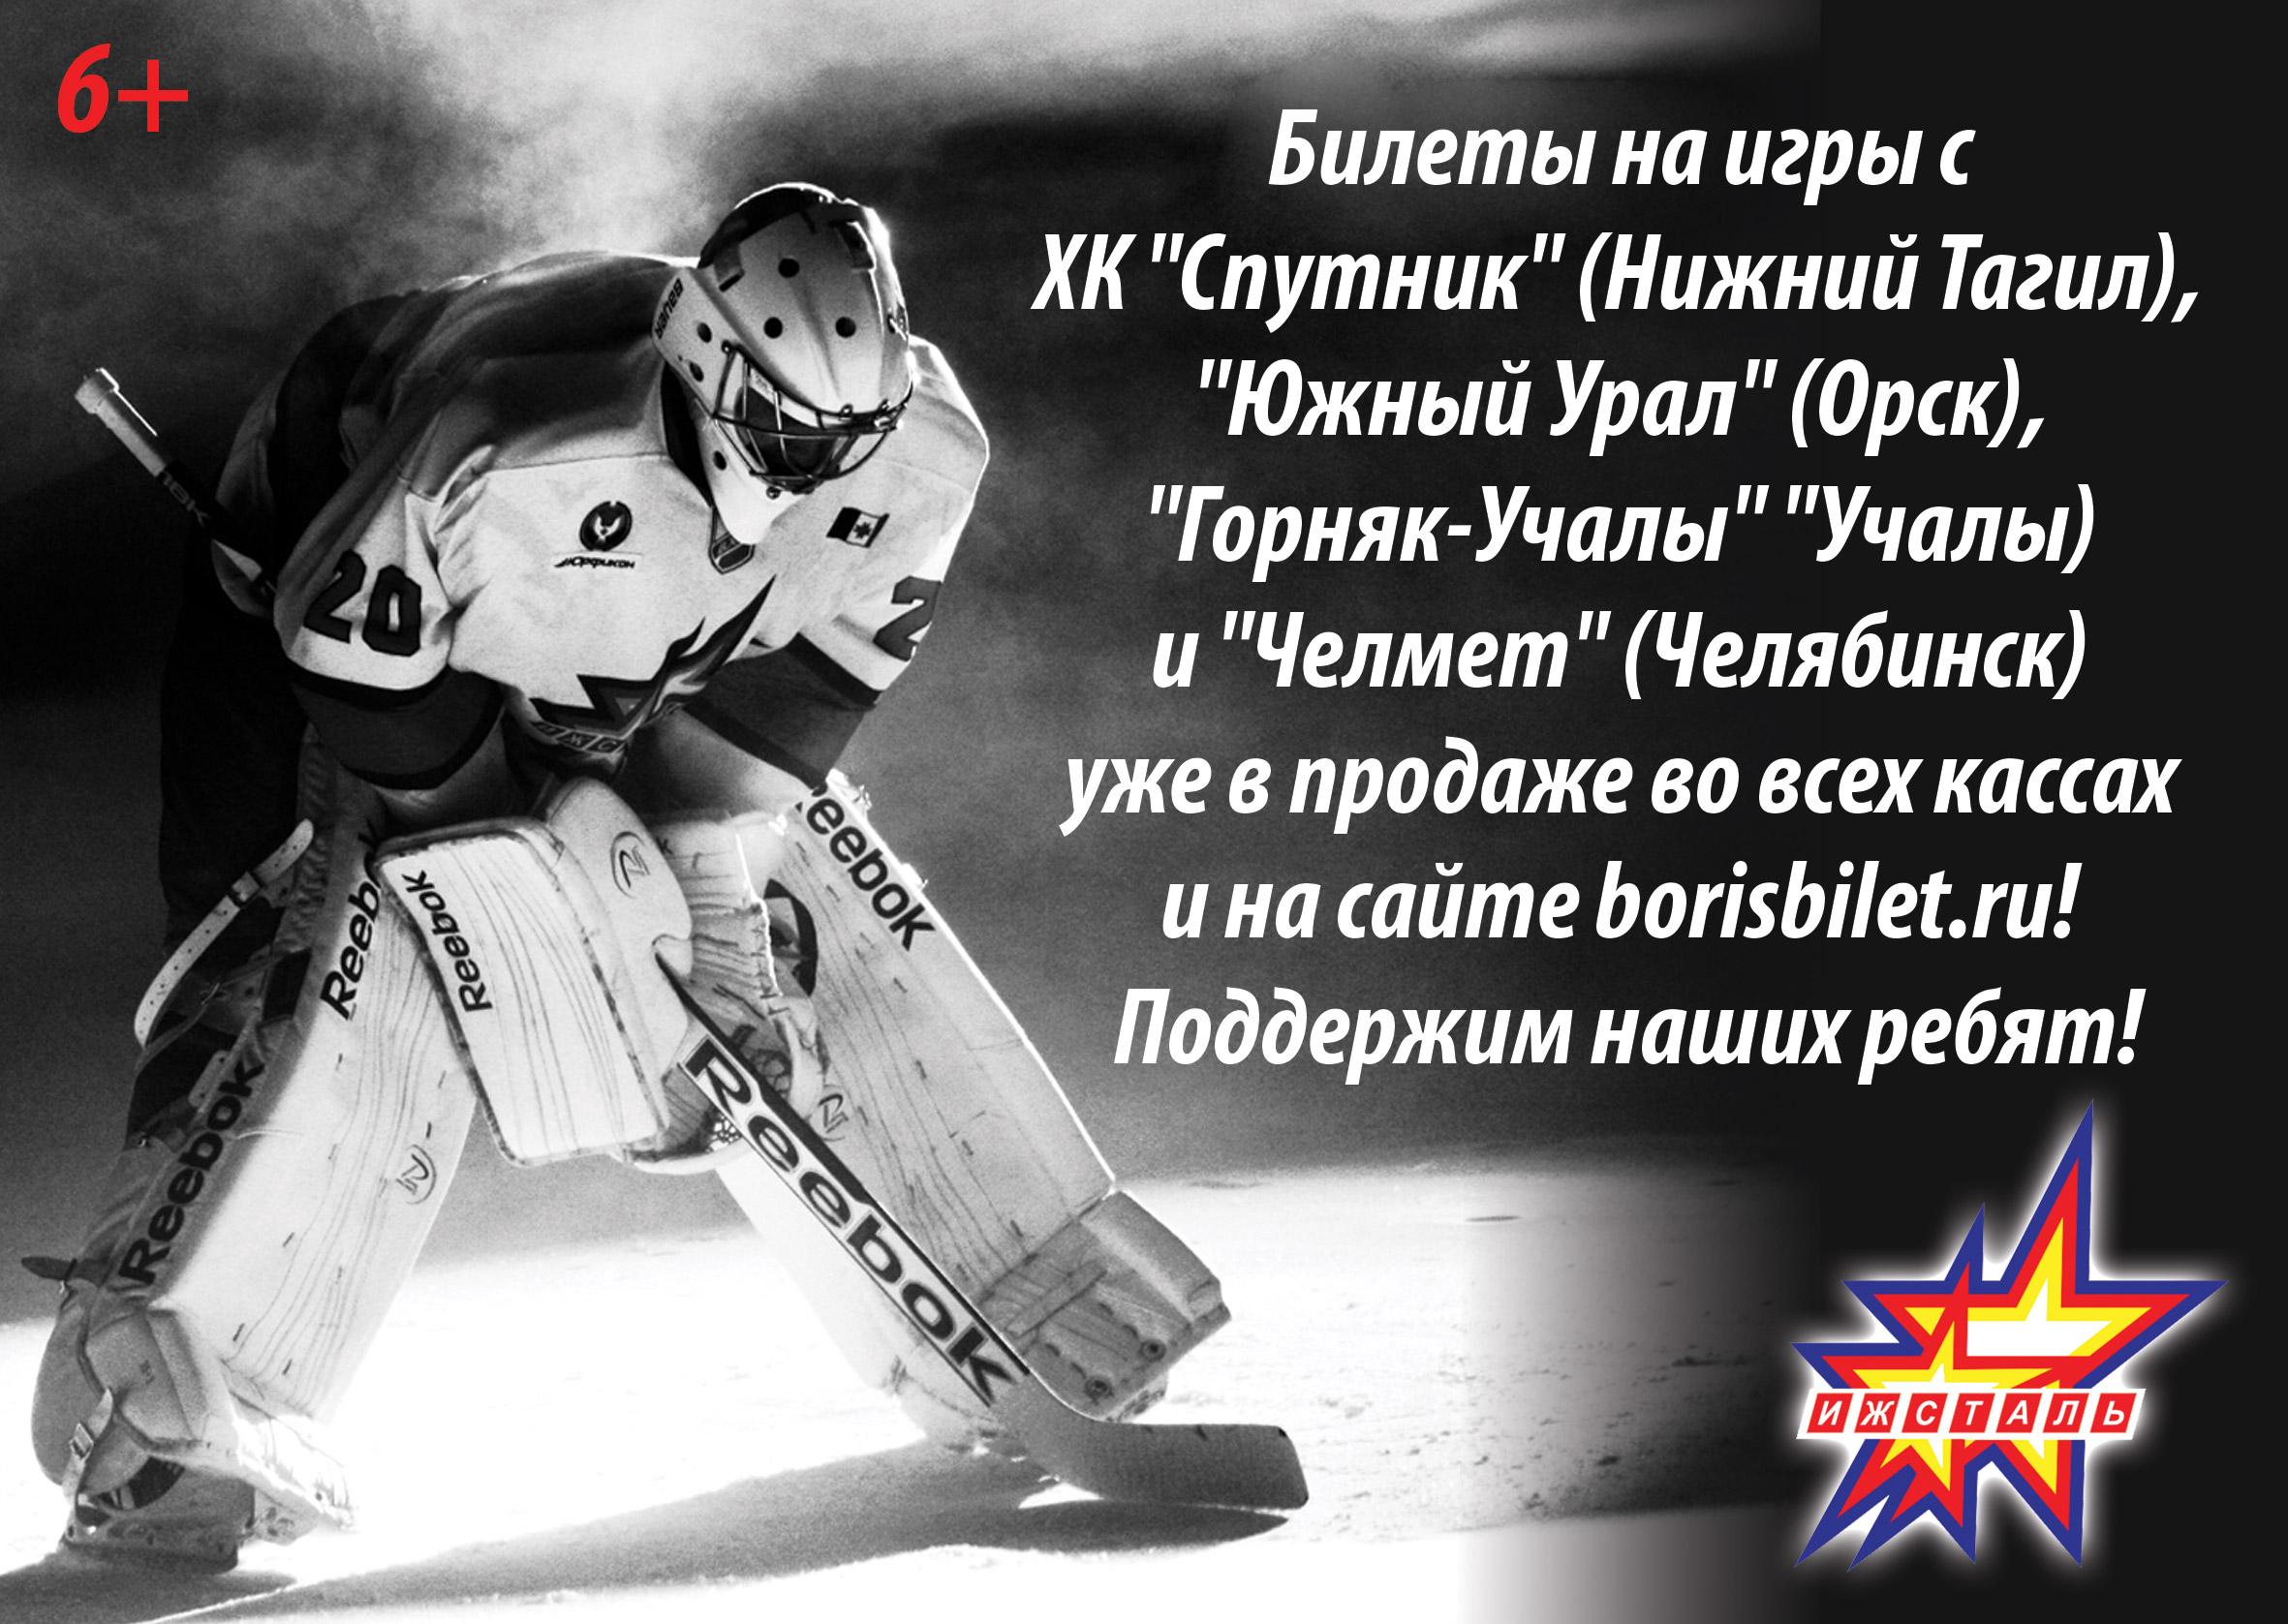 http://sh.uploads.ru/7xz0I.jpg